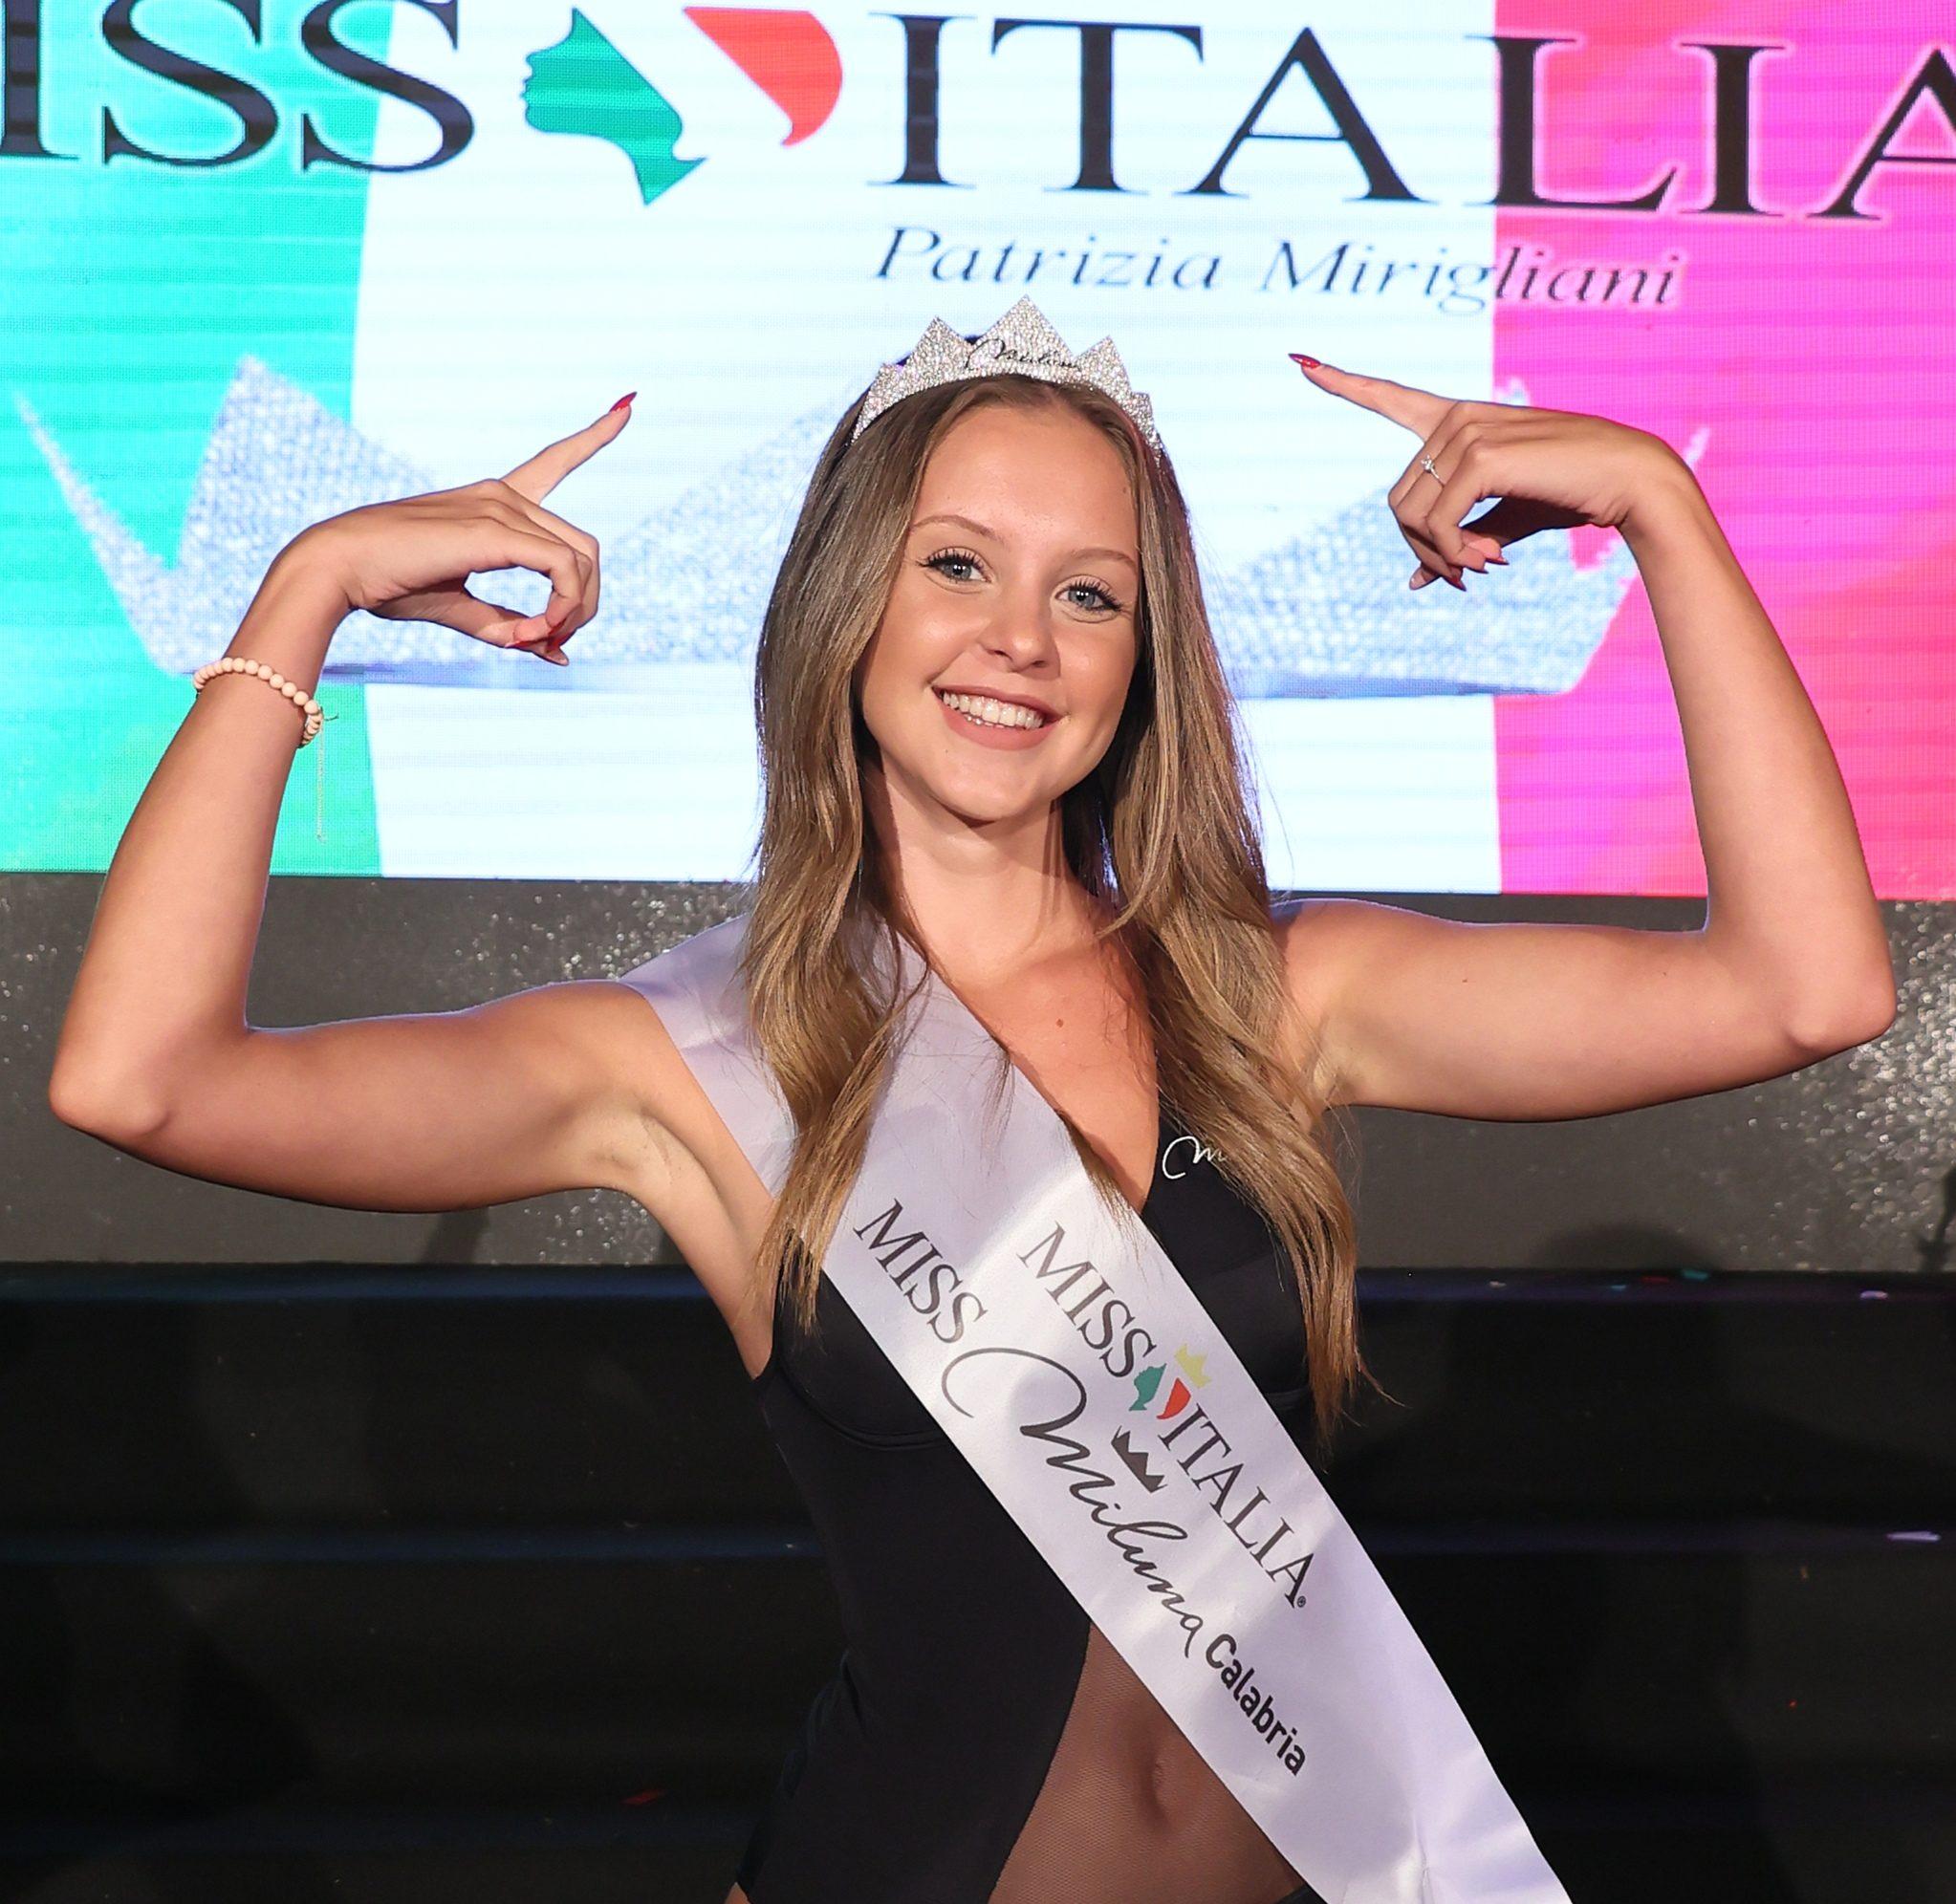 Miss Miluna Calabria